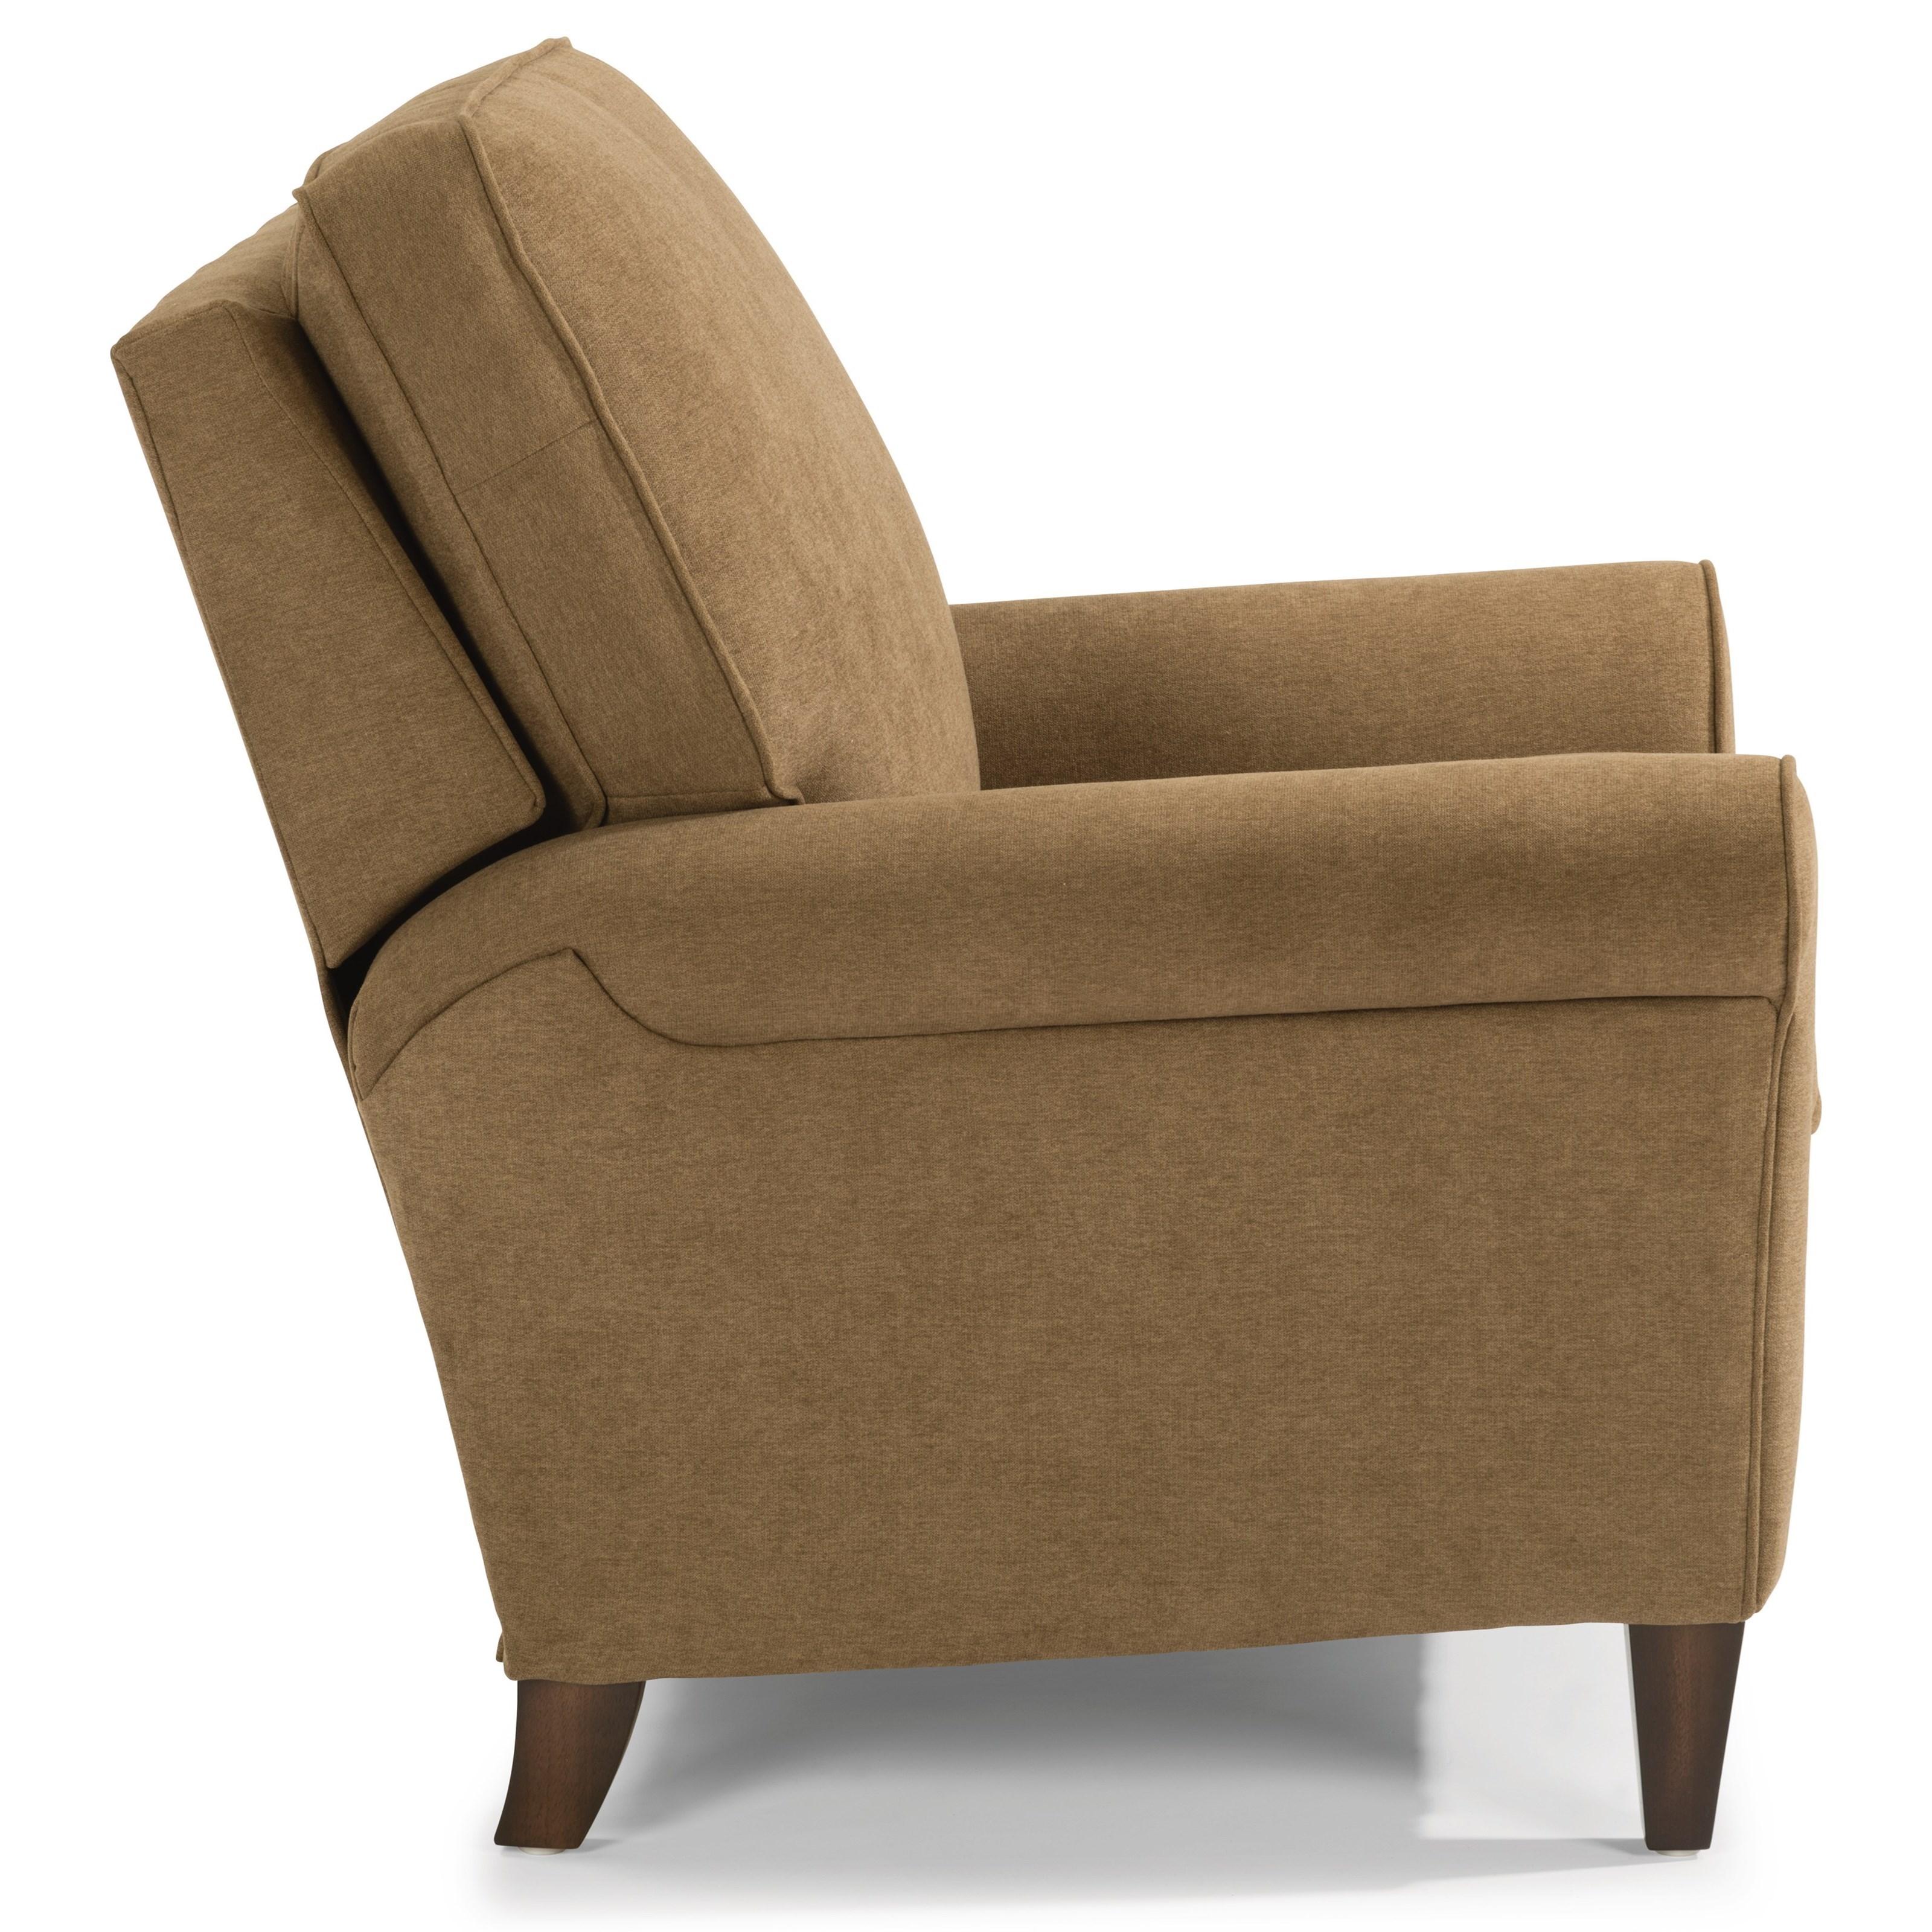 Flexsteel Westside Sofa Reviews: Flexsteel Westside Casual Style High Leg Recliner